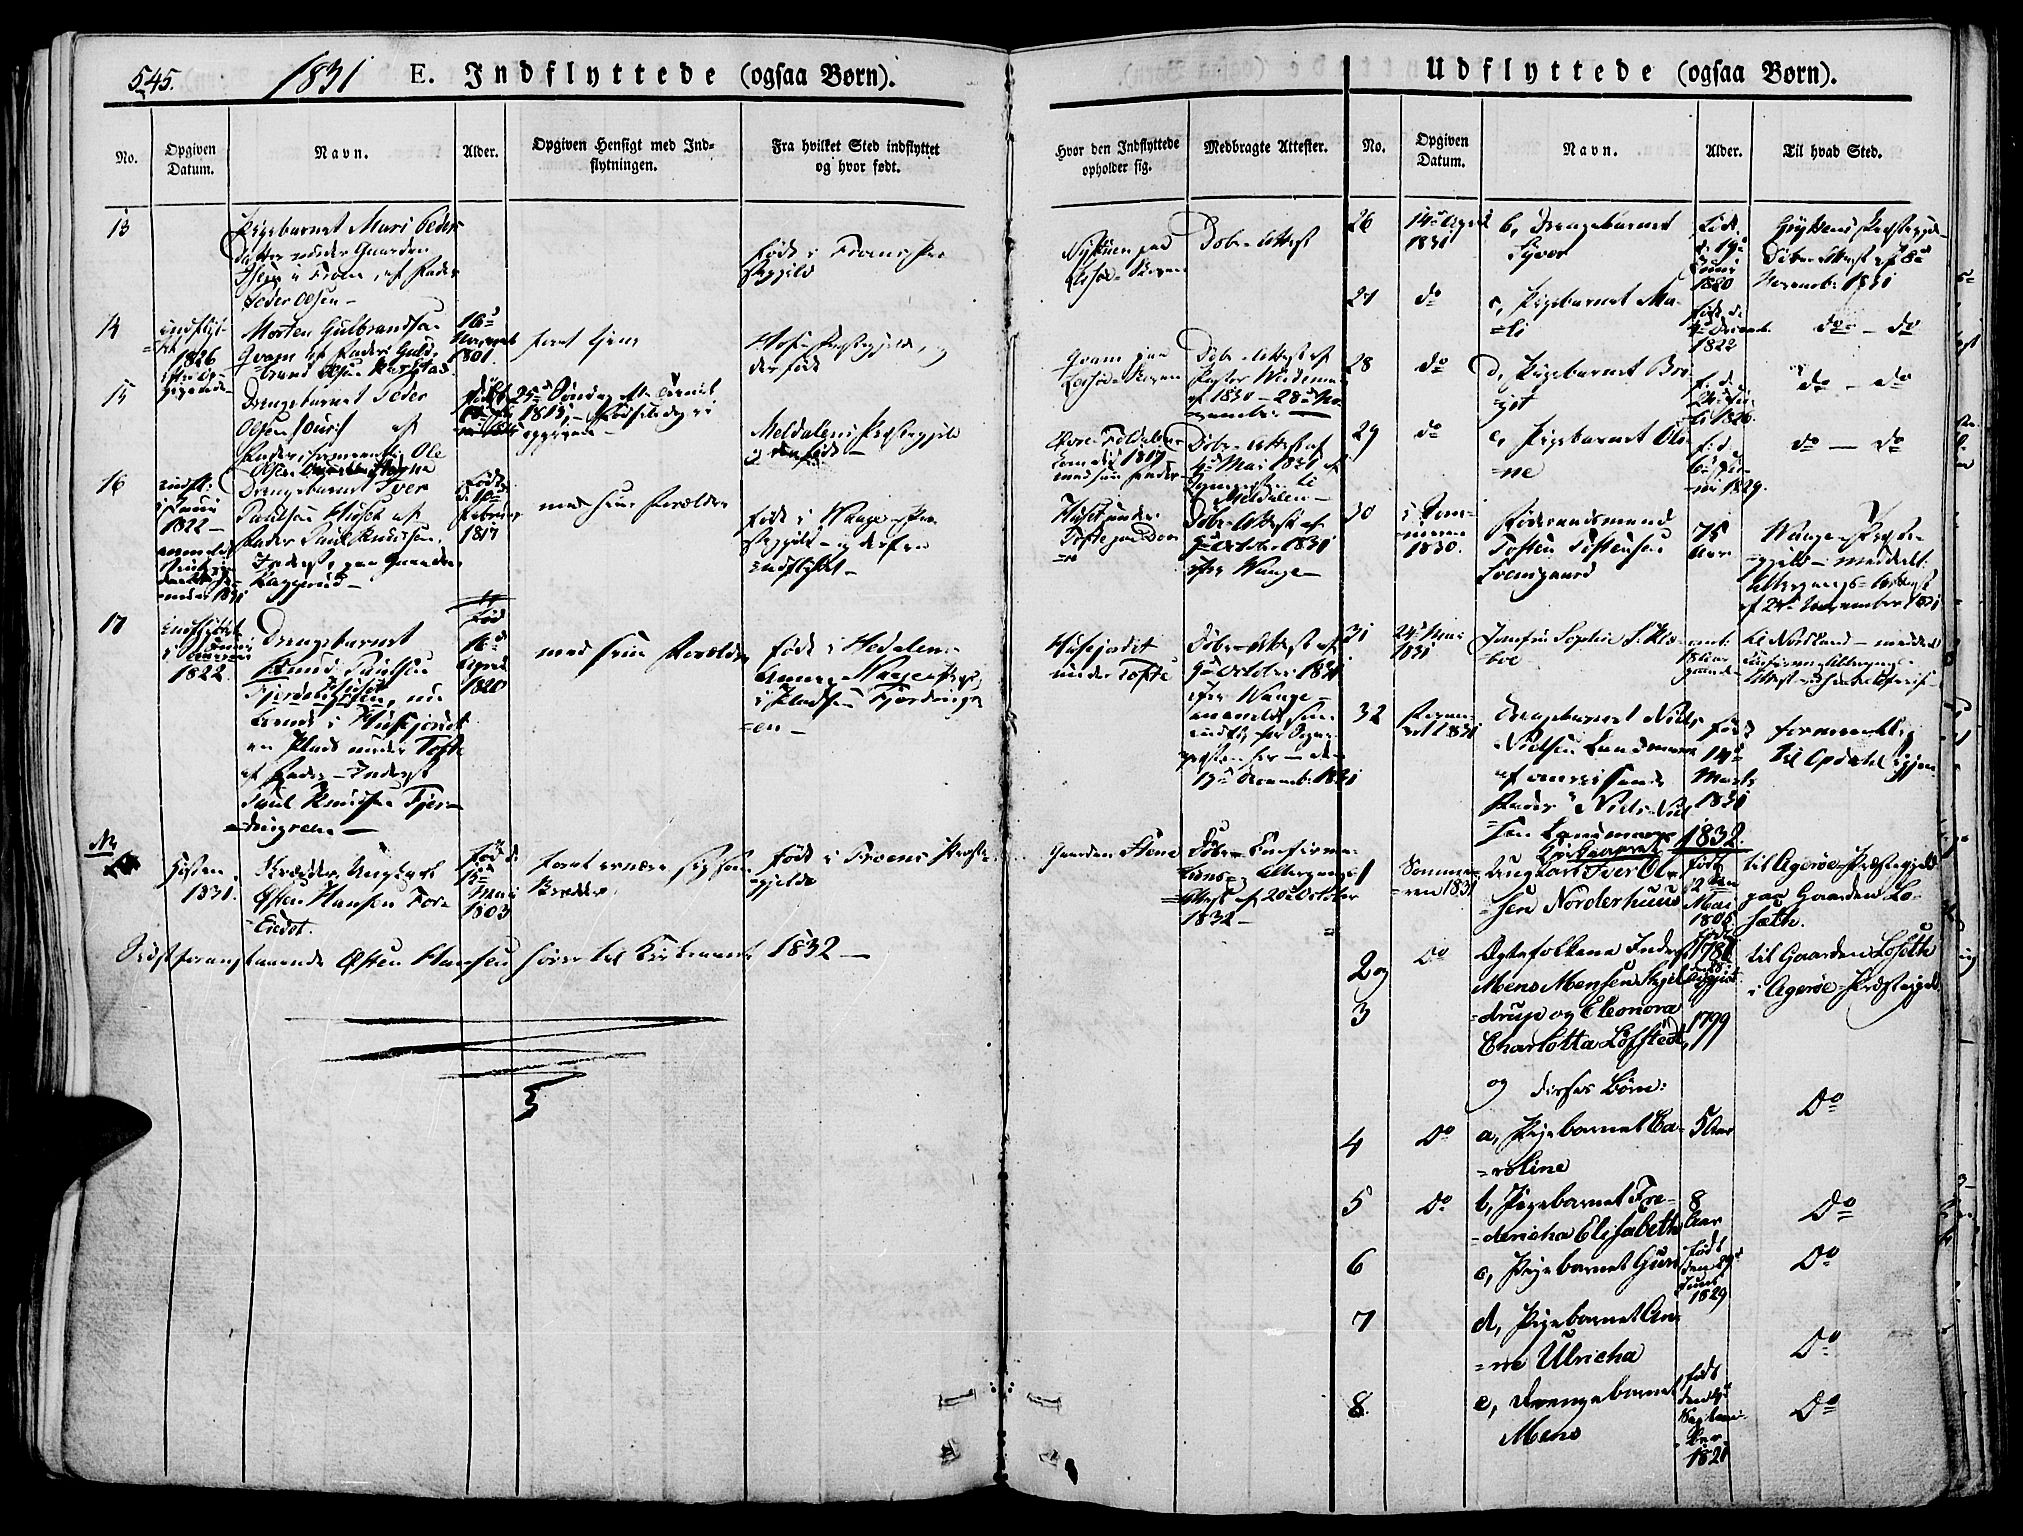 SAH, Lesja prestekontor, Ministerialbok nr. 5, 1830-1842, s. 545